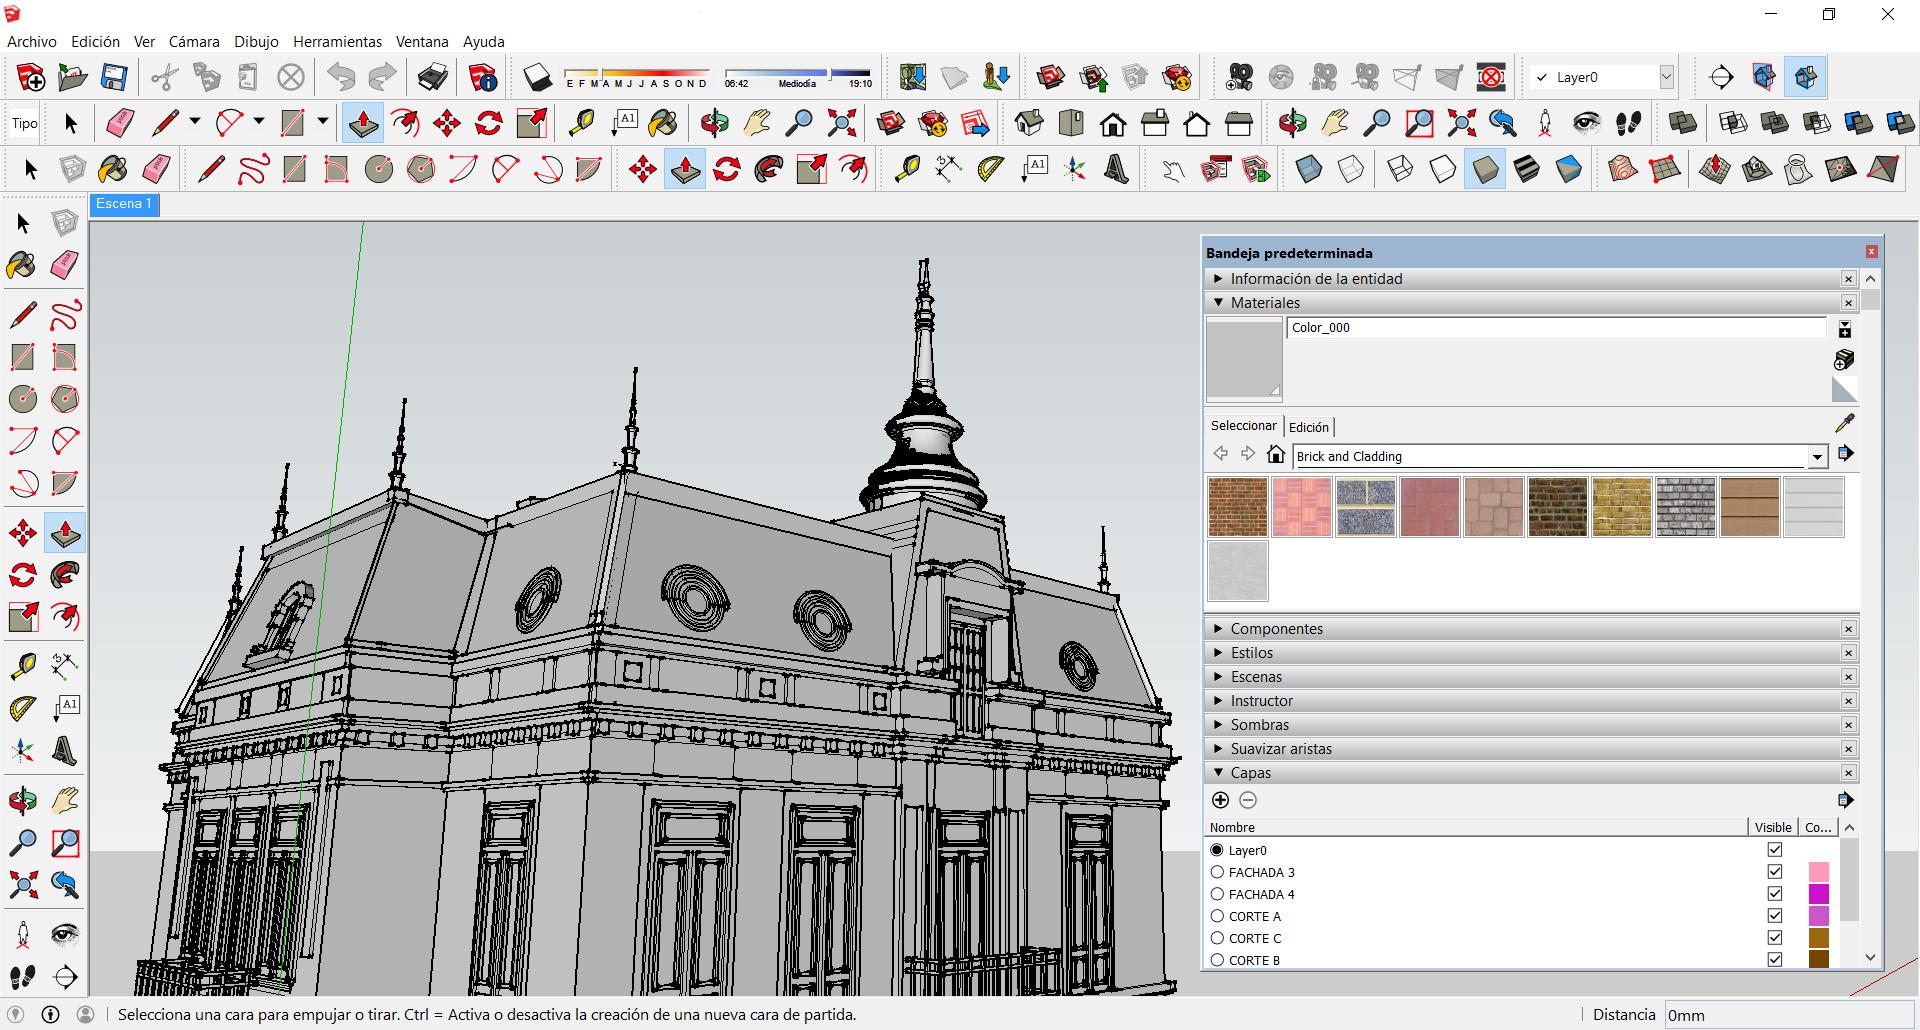 Sketchup Tag Plataforma Arquitectura # Muebles Google Sketchup